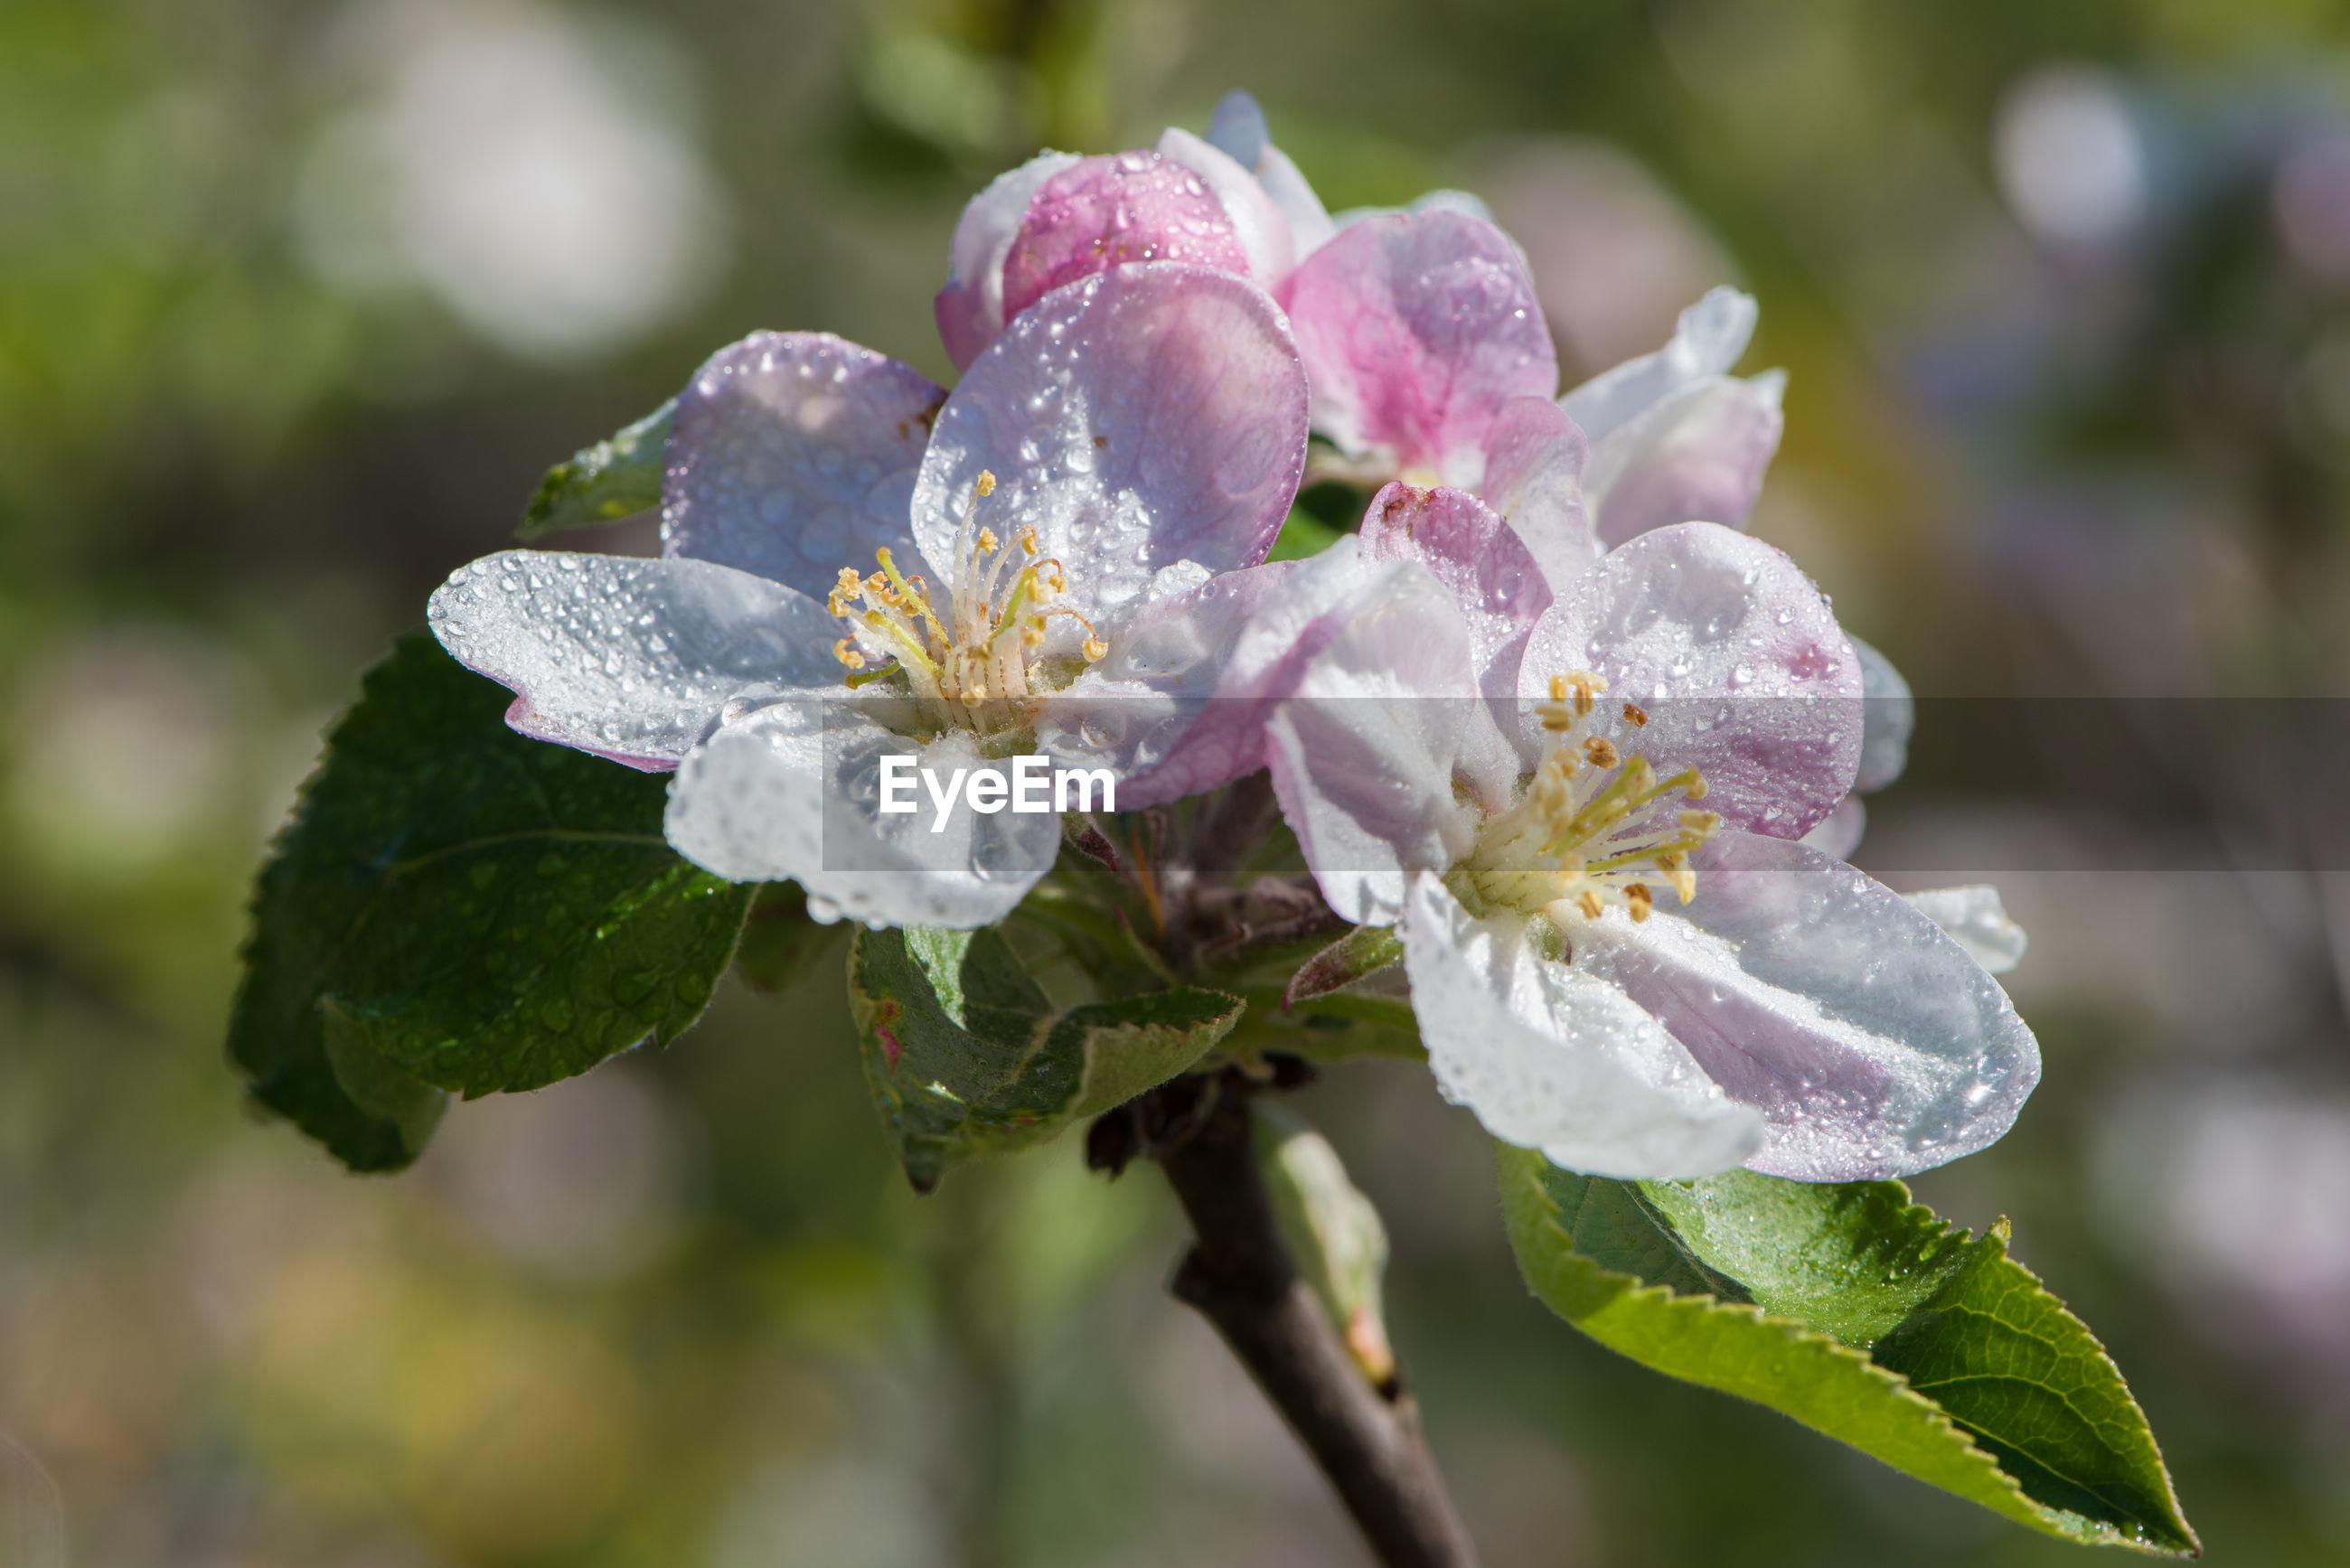 CLOSE-UP OF WET PURPLE FLOWERING PLANTS